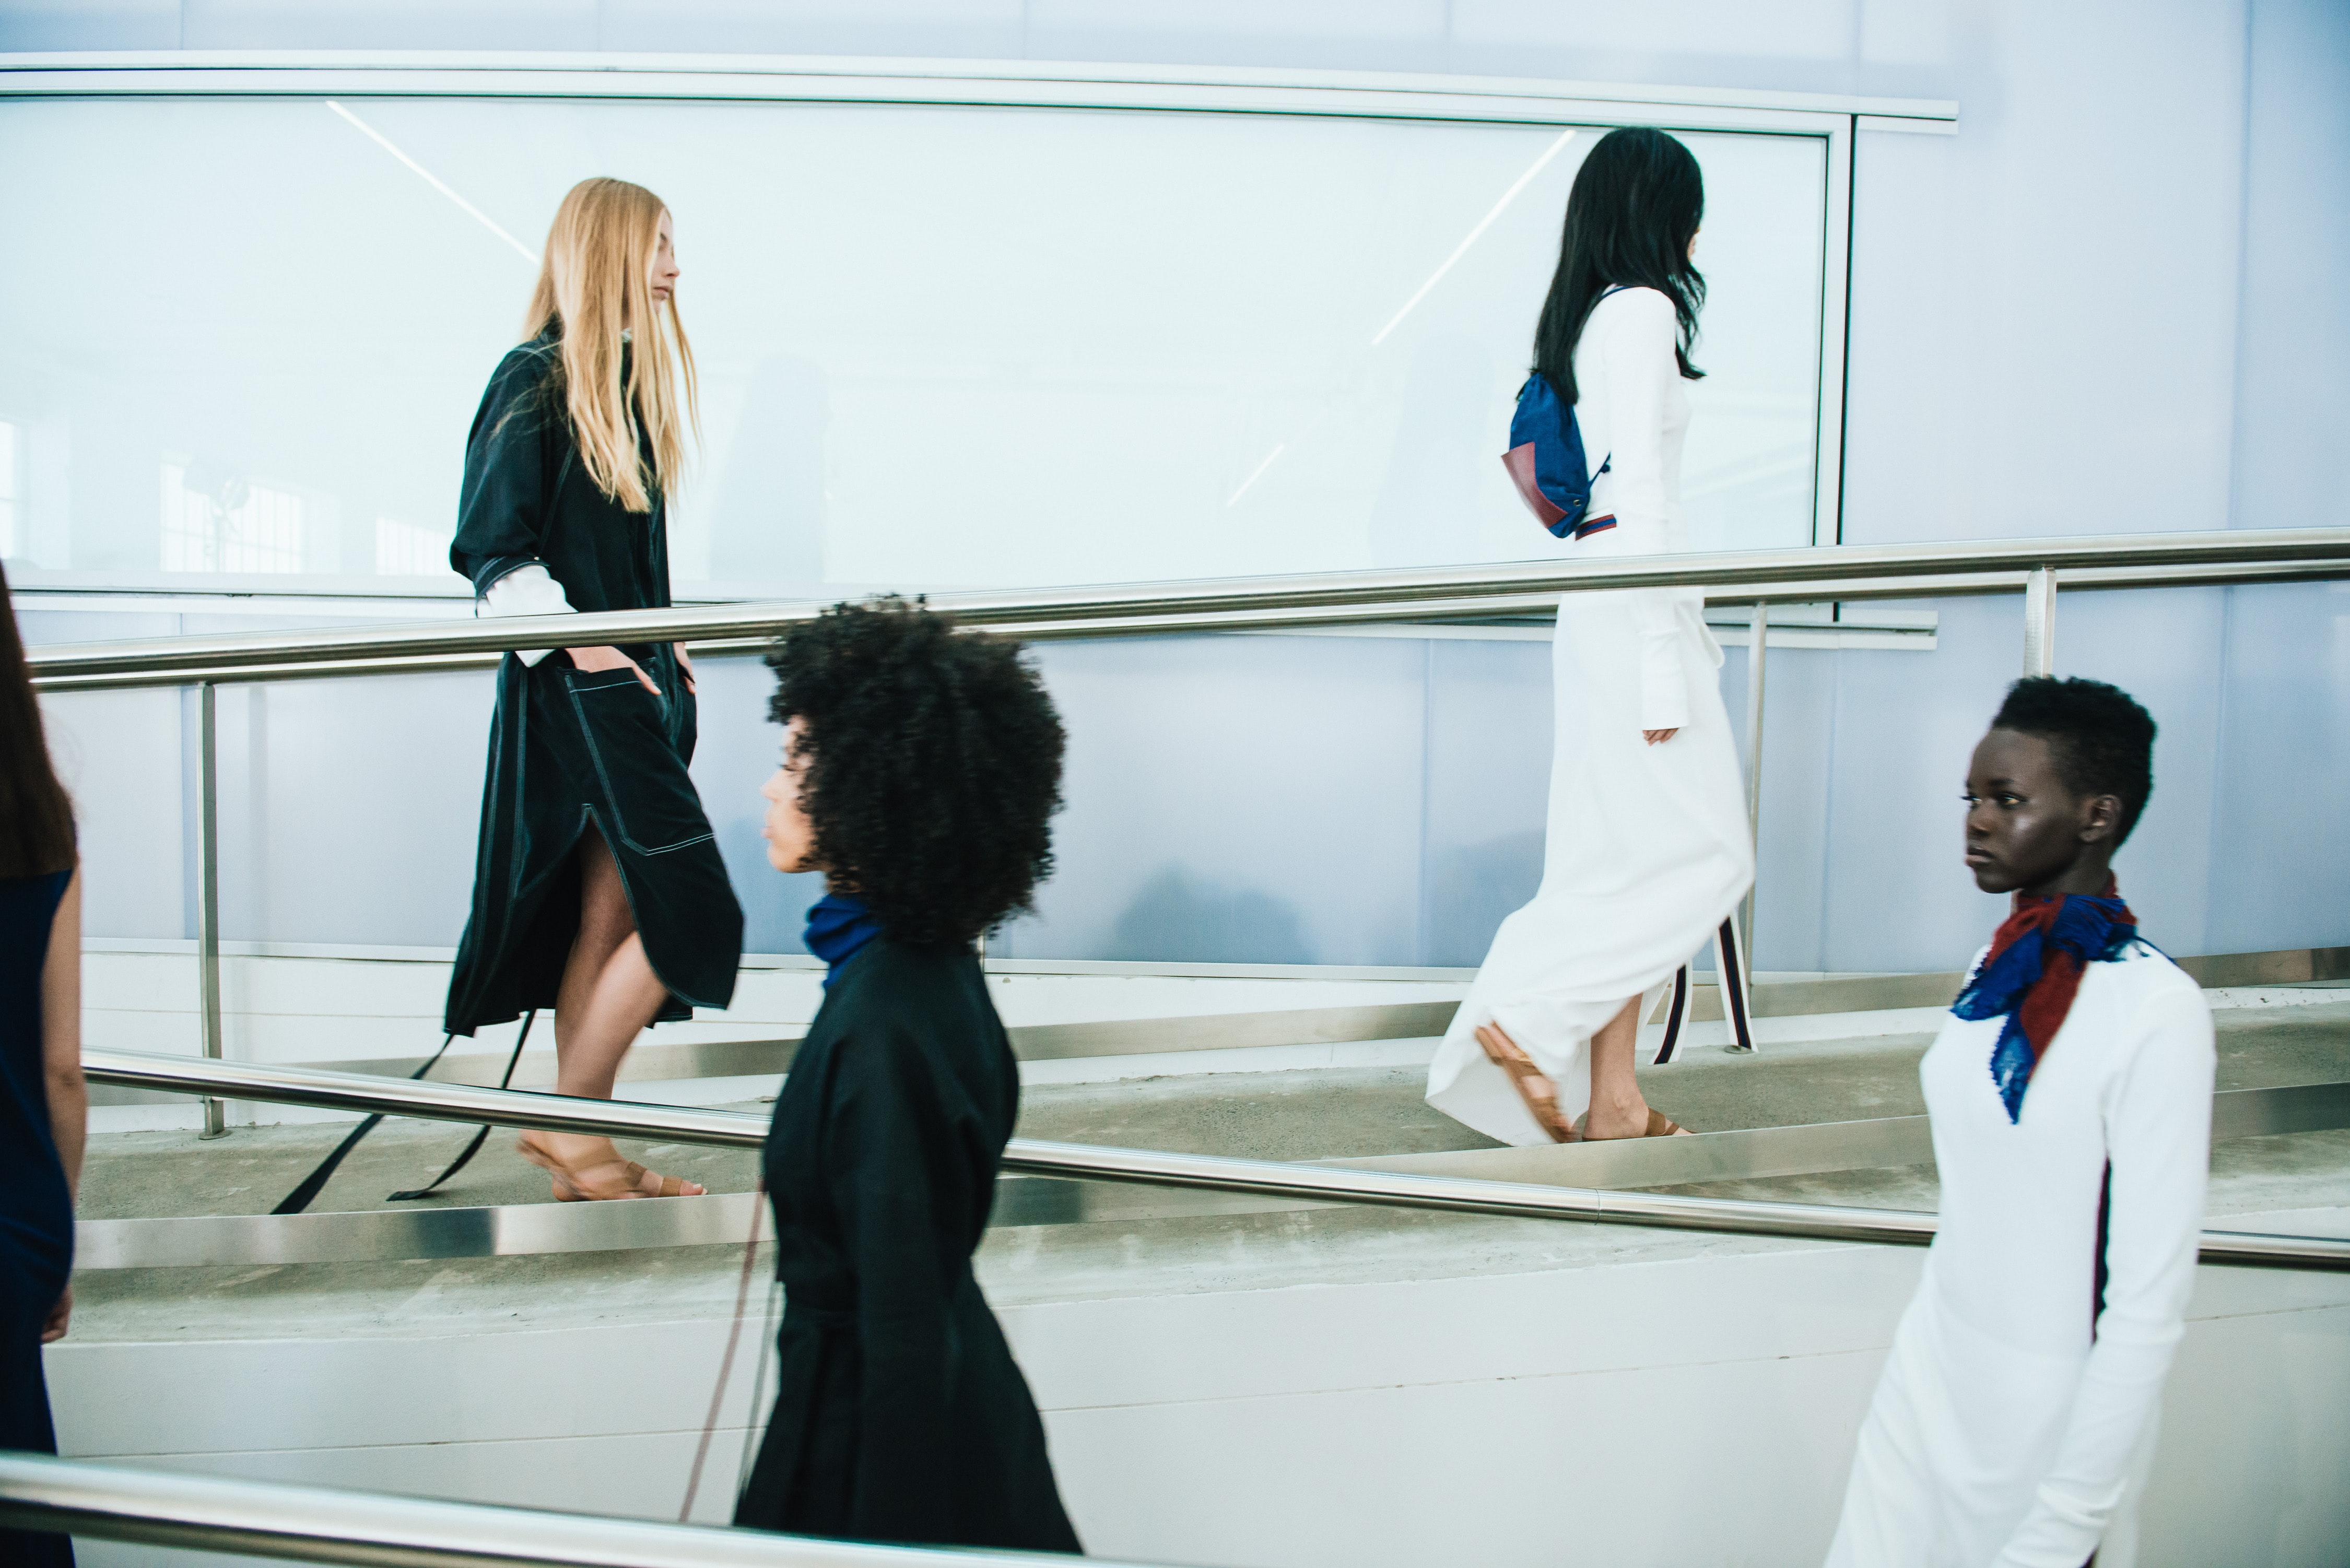 Get more out of Paris Fashion Week